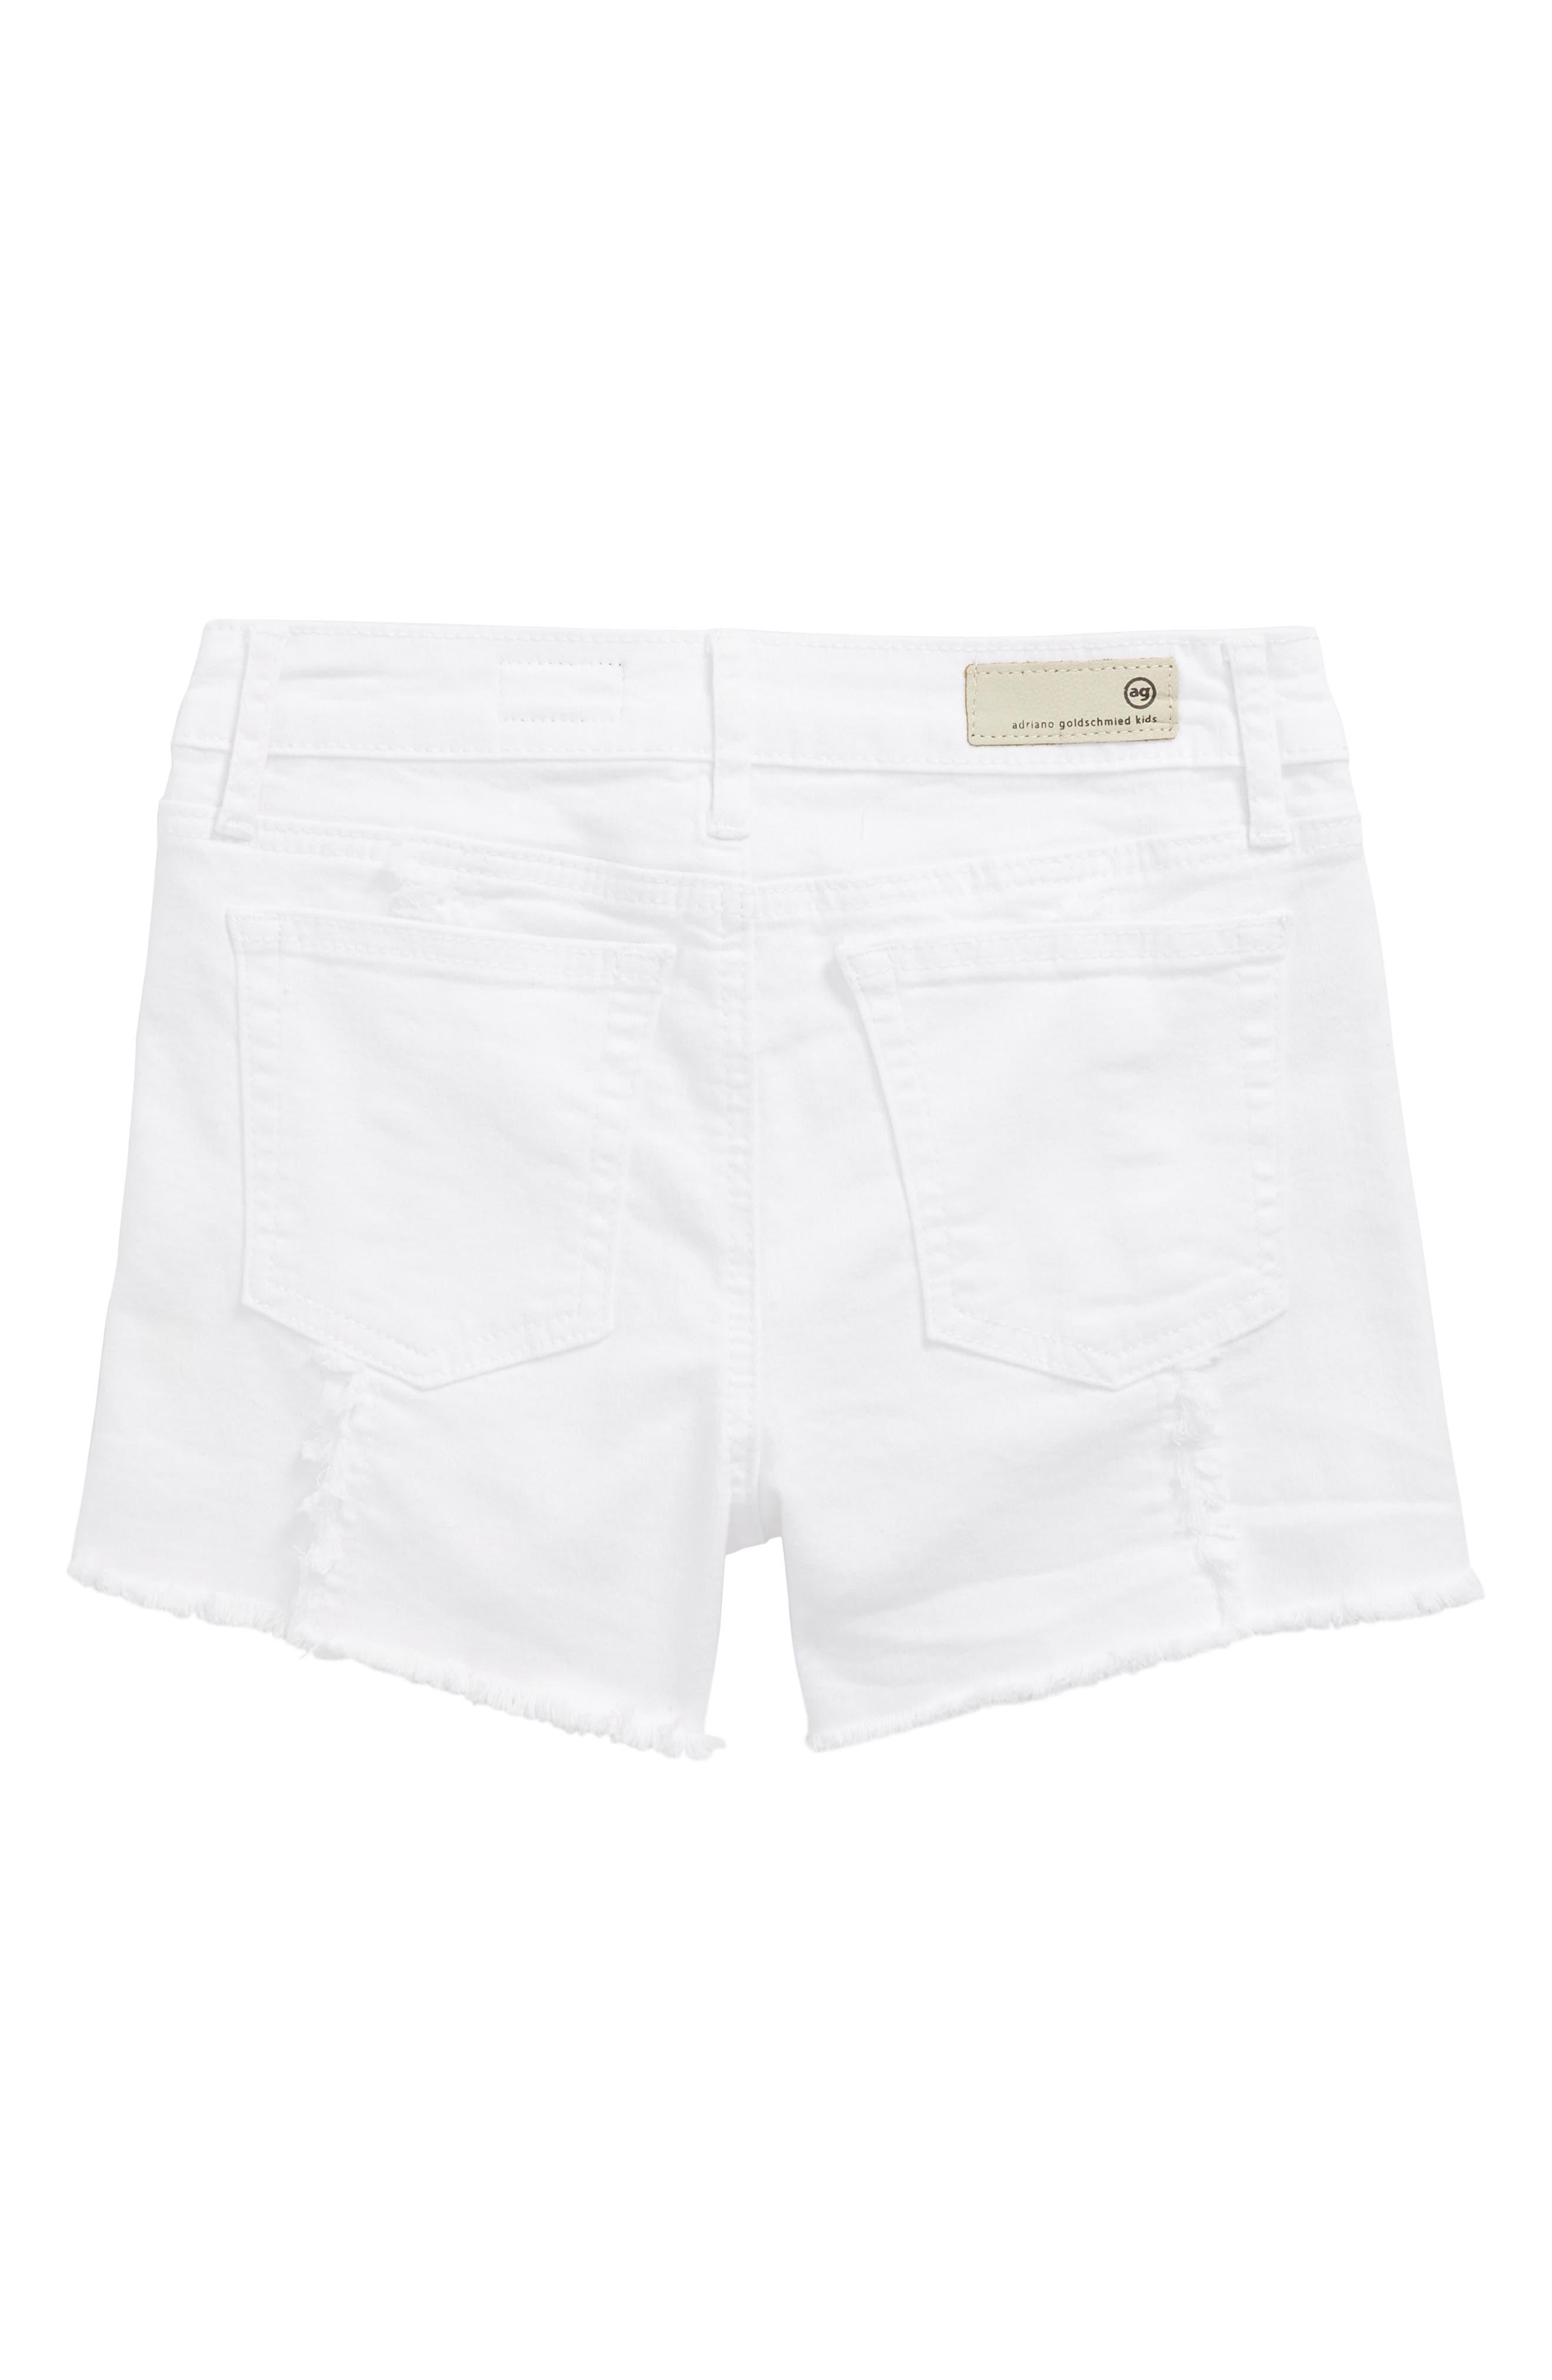 AG The Sandy Shorts,                             Alternate thumbnail 2, color,                             White